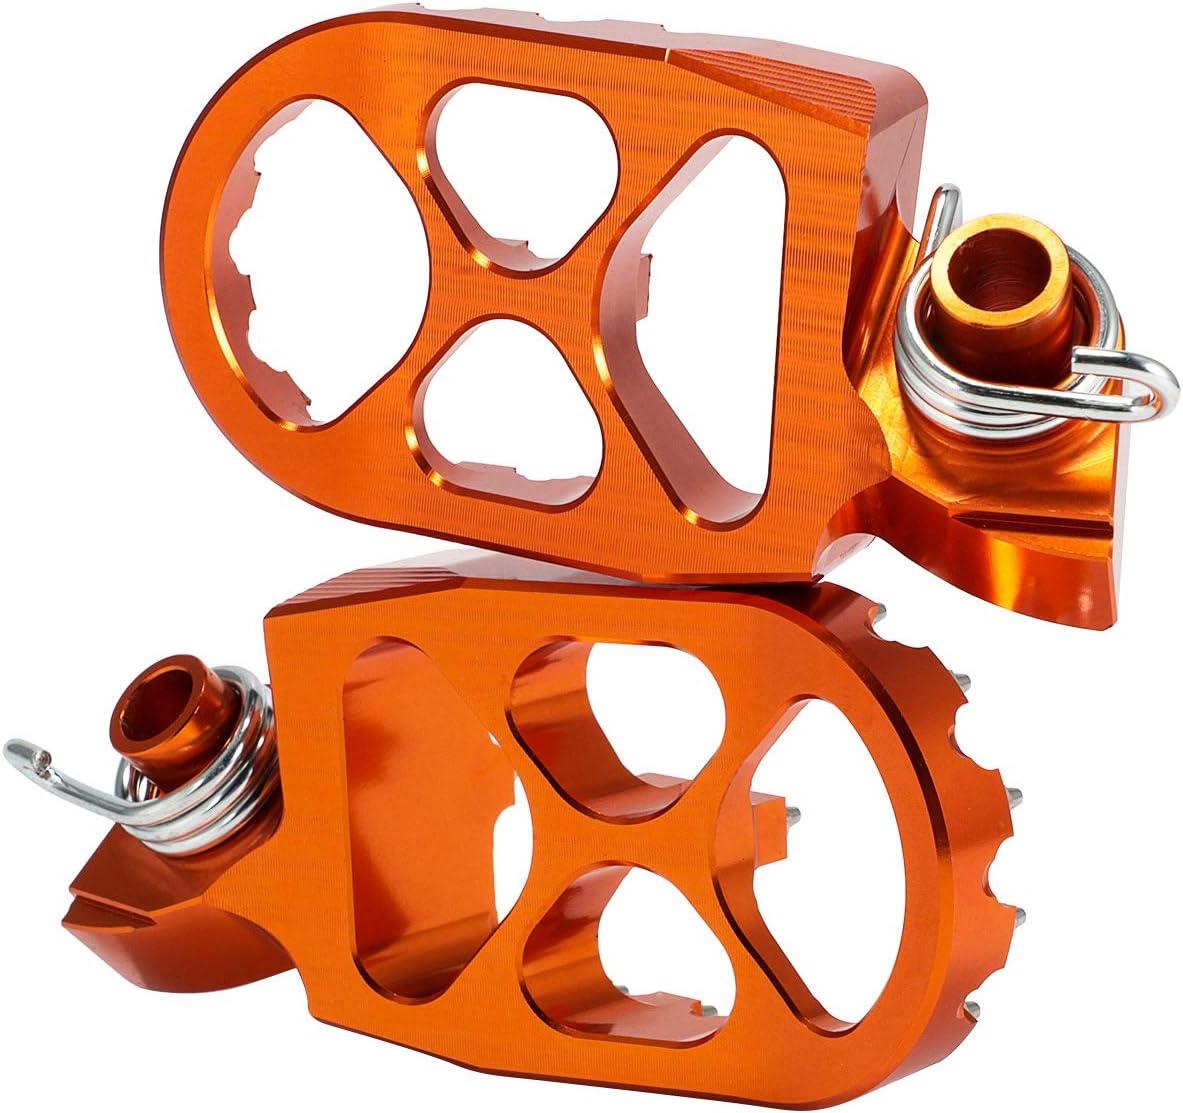 Motorcycle Parts Vehicle Parts & Accessories KTM 250 EXC-F EXC ...